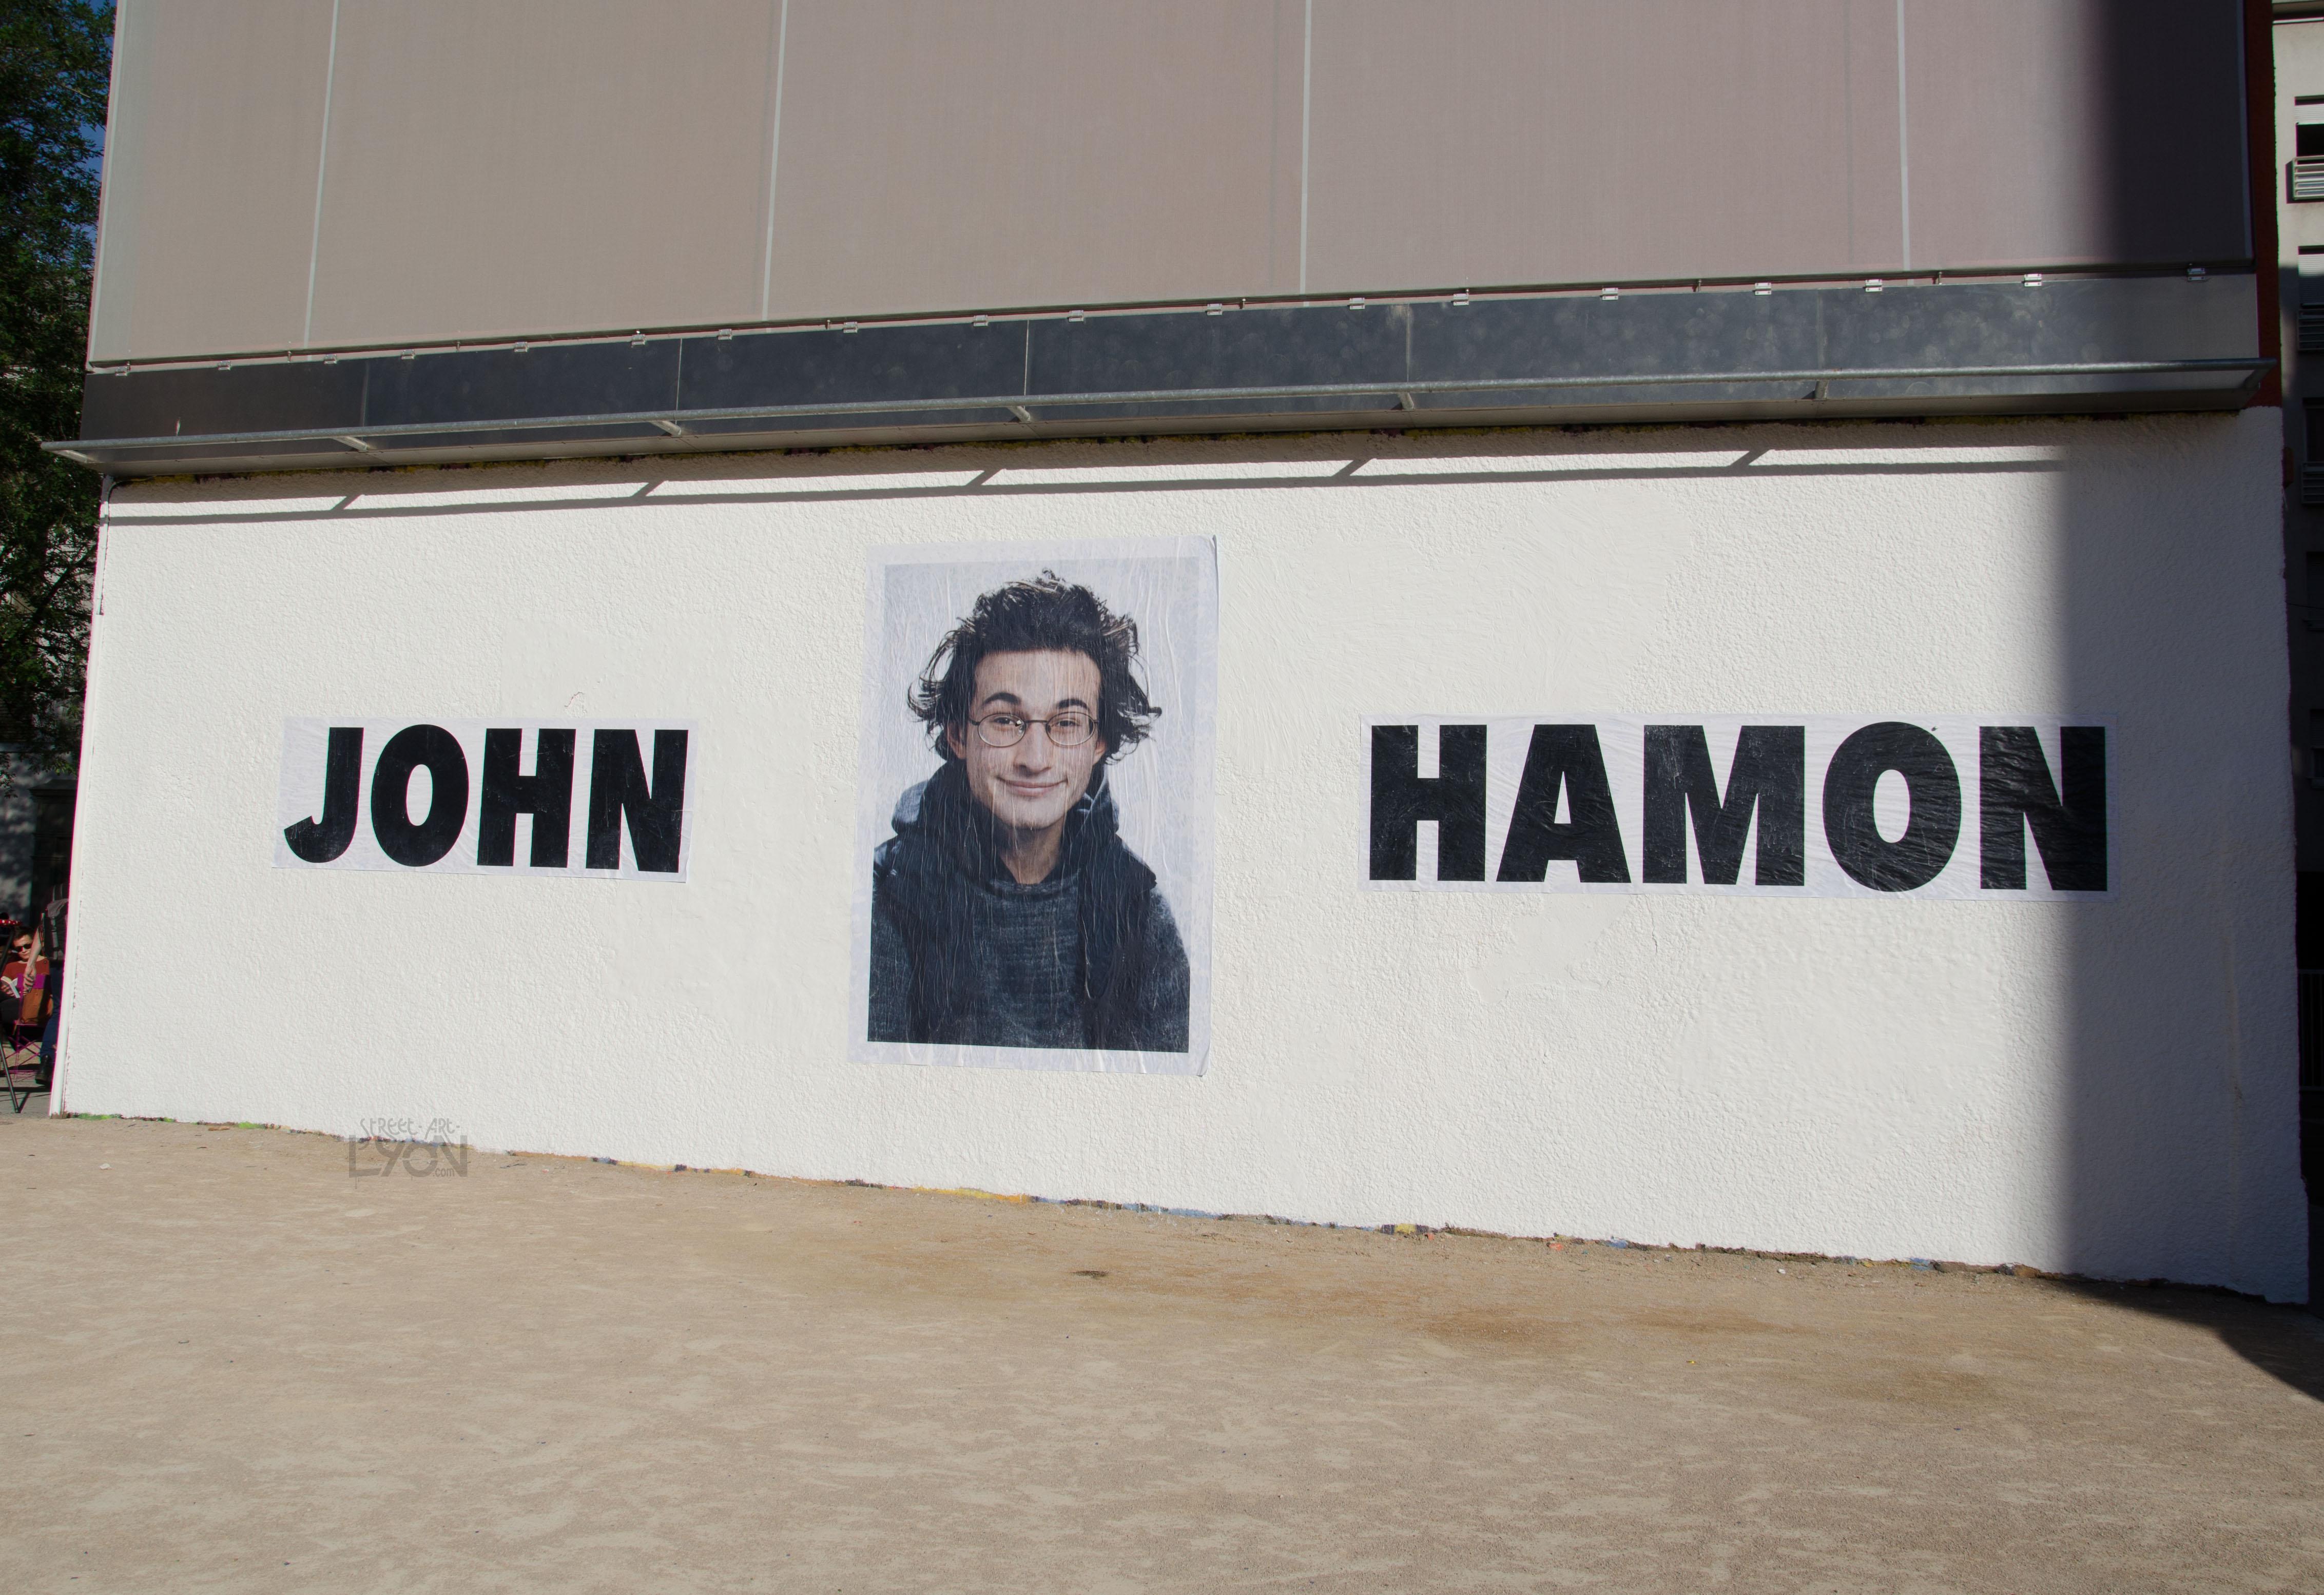 johnhamon-mazgran